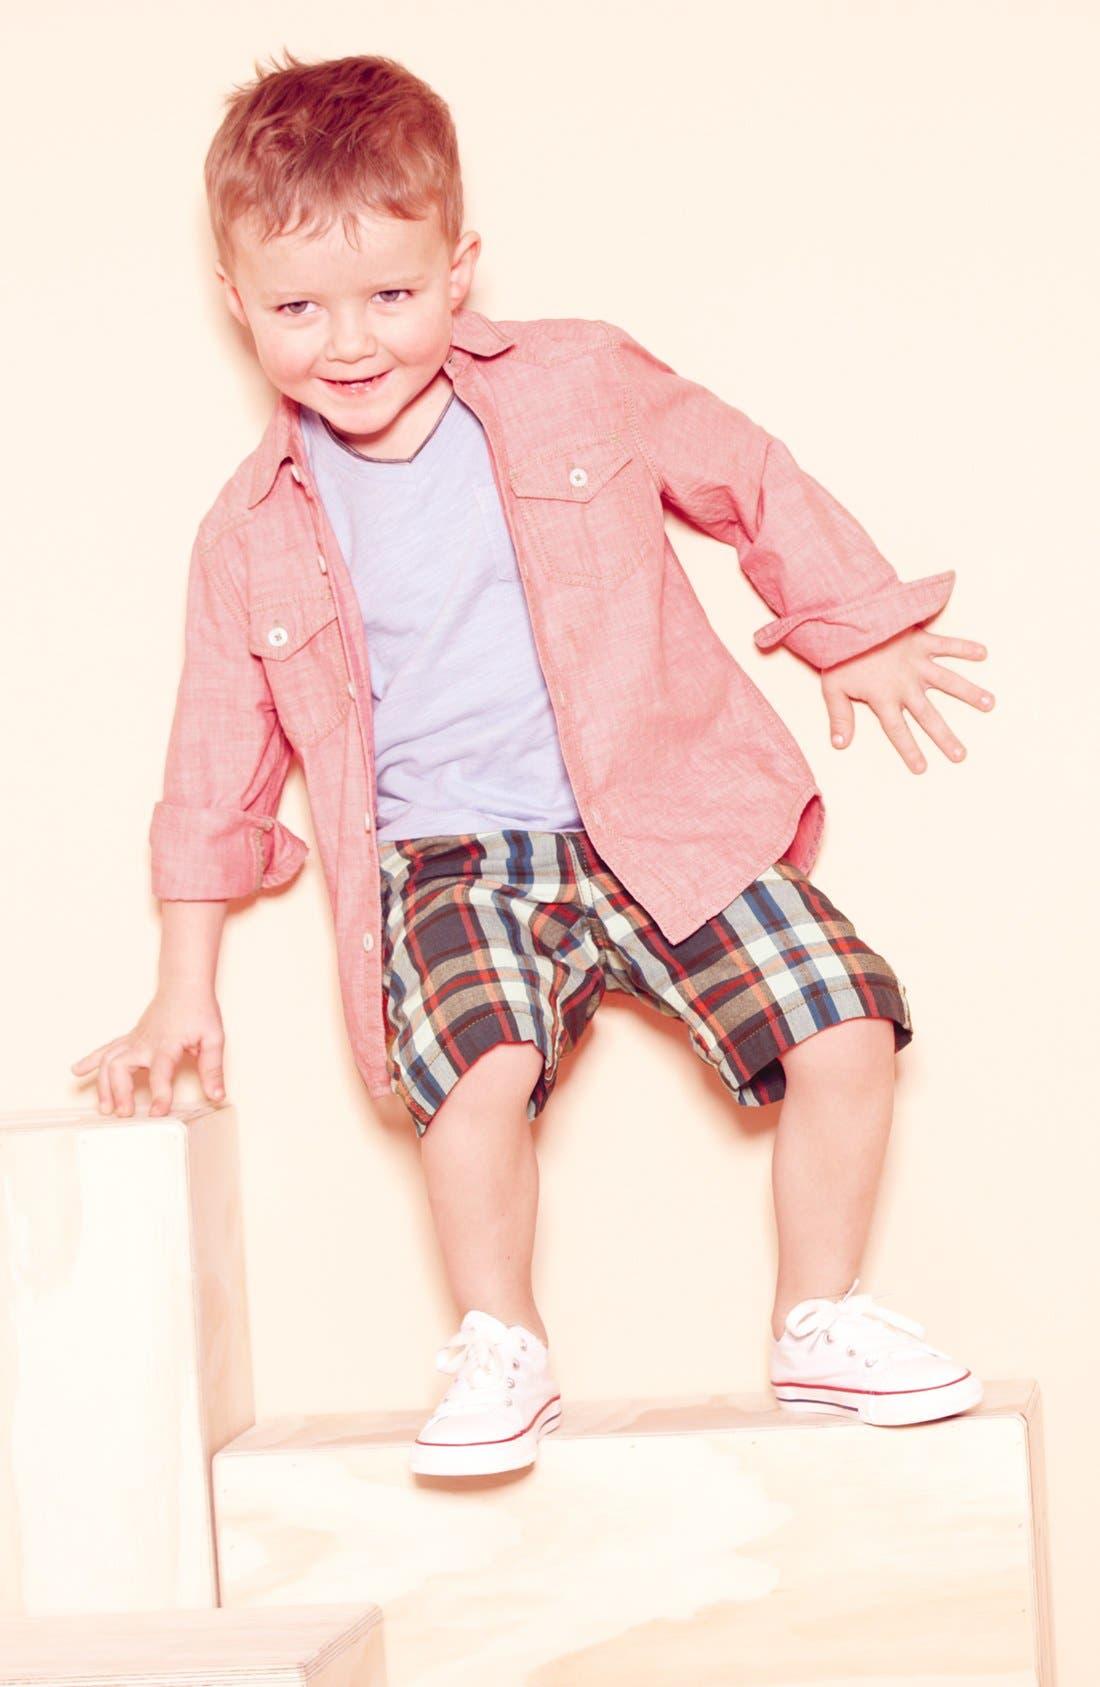 Alternate Image 1 Selected - Tucker + Tate Chambray Shirt, T-Shirt & Converse Sneaker (Toddler)